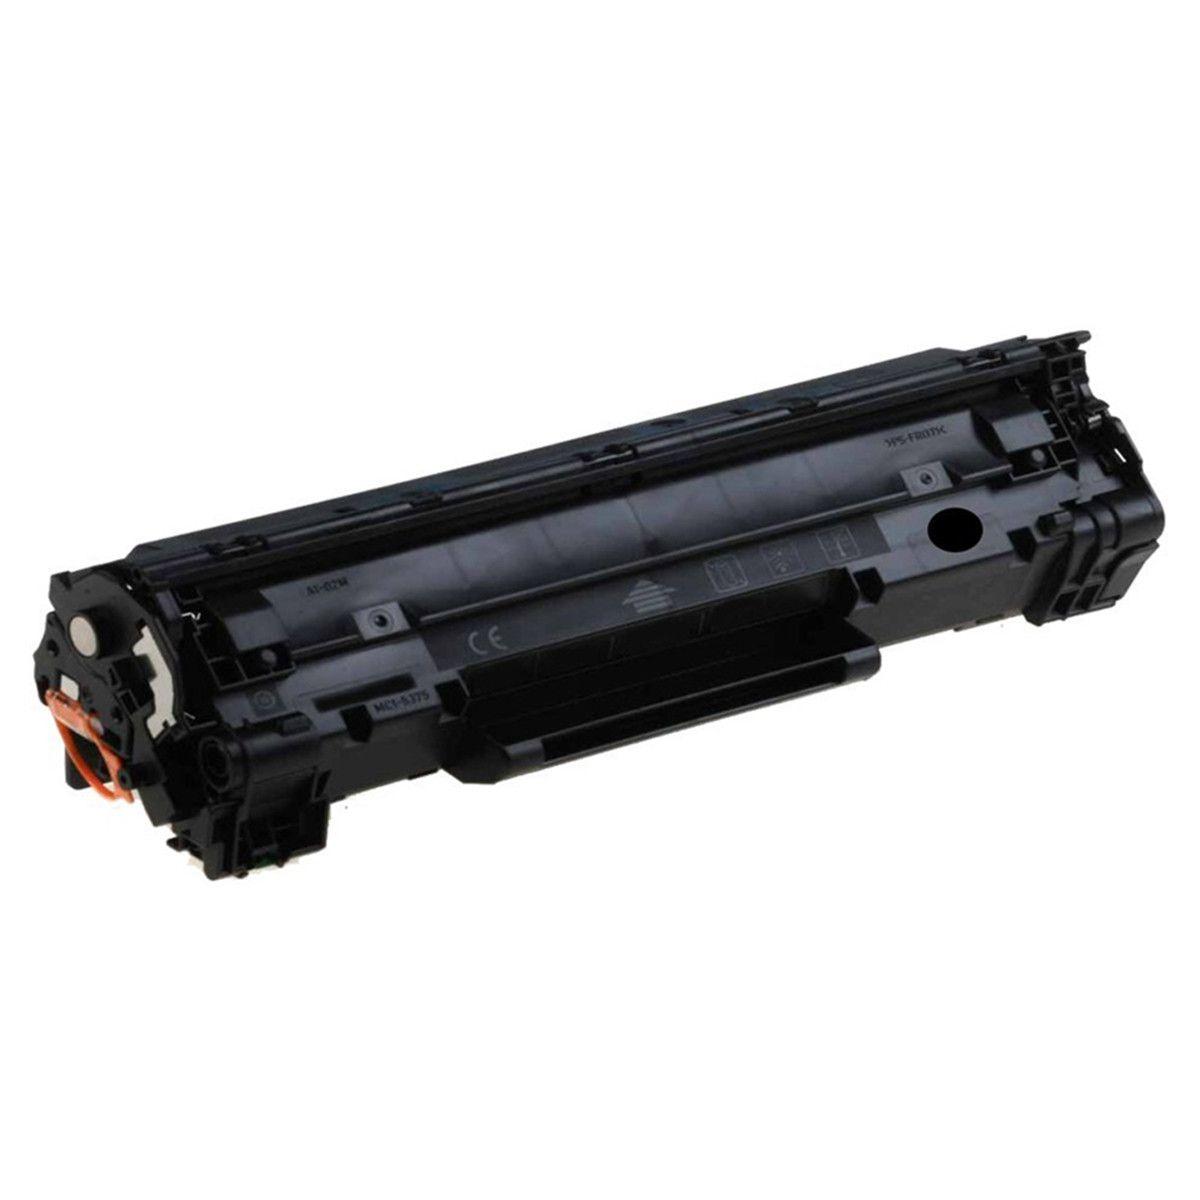 TONER COMPATÍVEL COM HP CF400A 201A CF400AB M252DW M277DW M252 M277 Black 1.500 Páginas - Cartucho & Cia